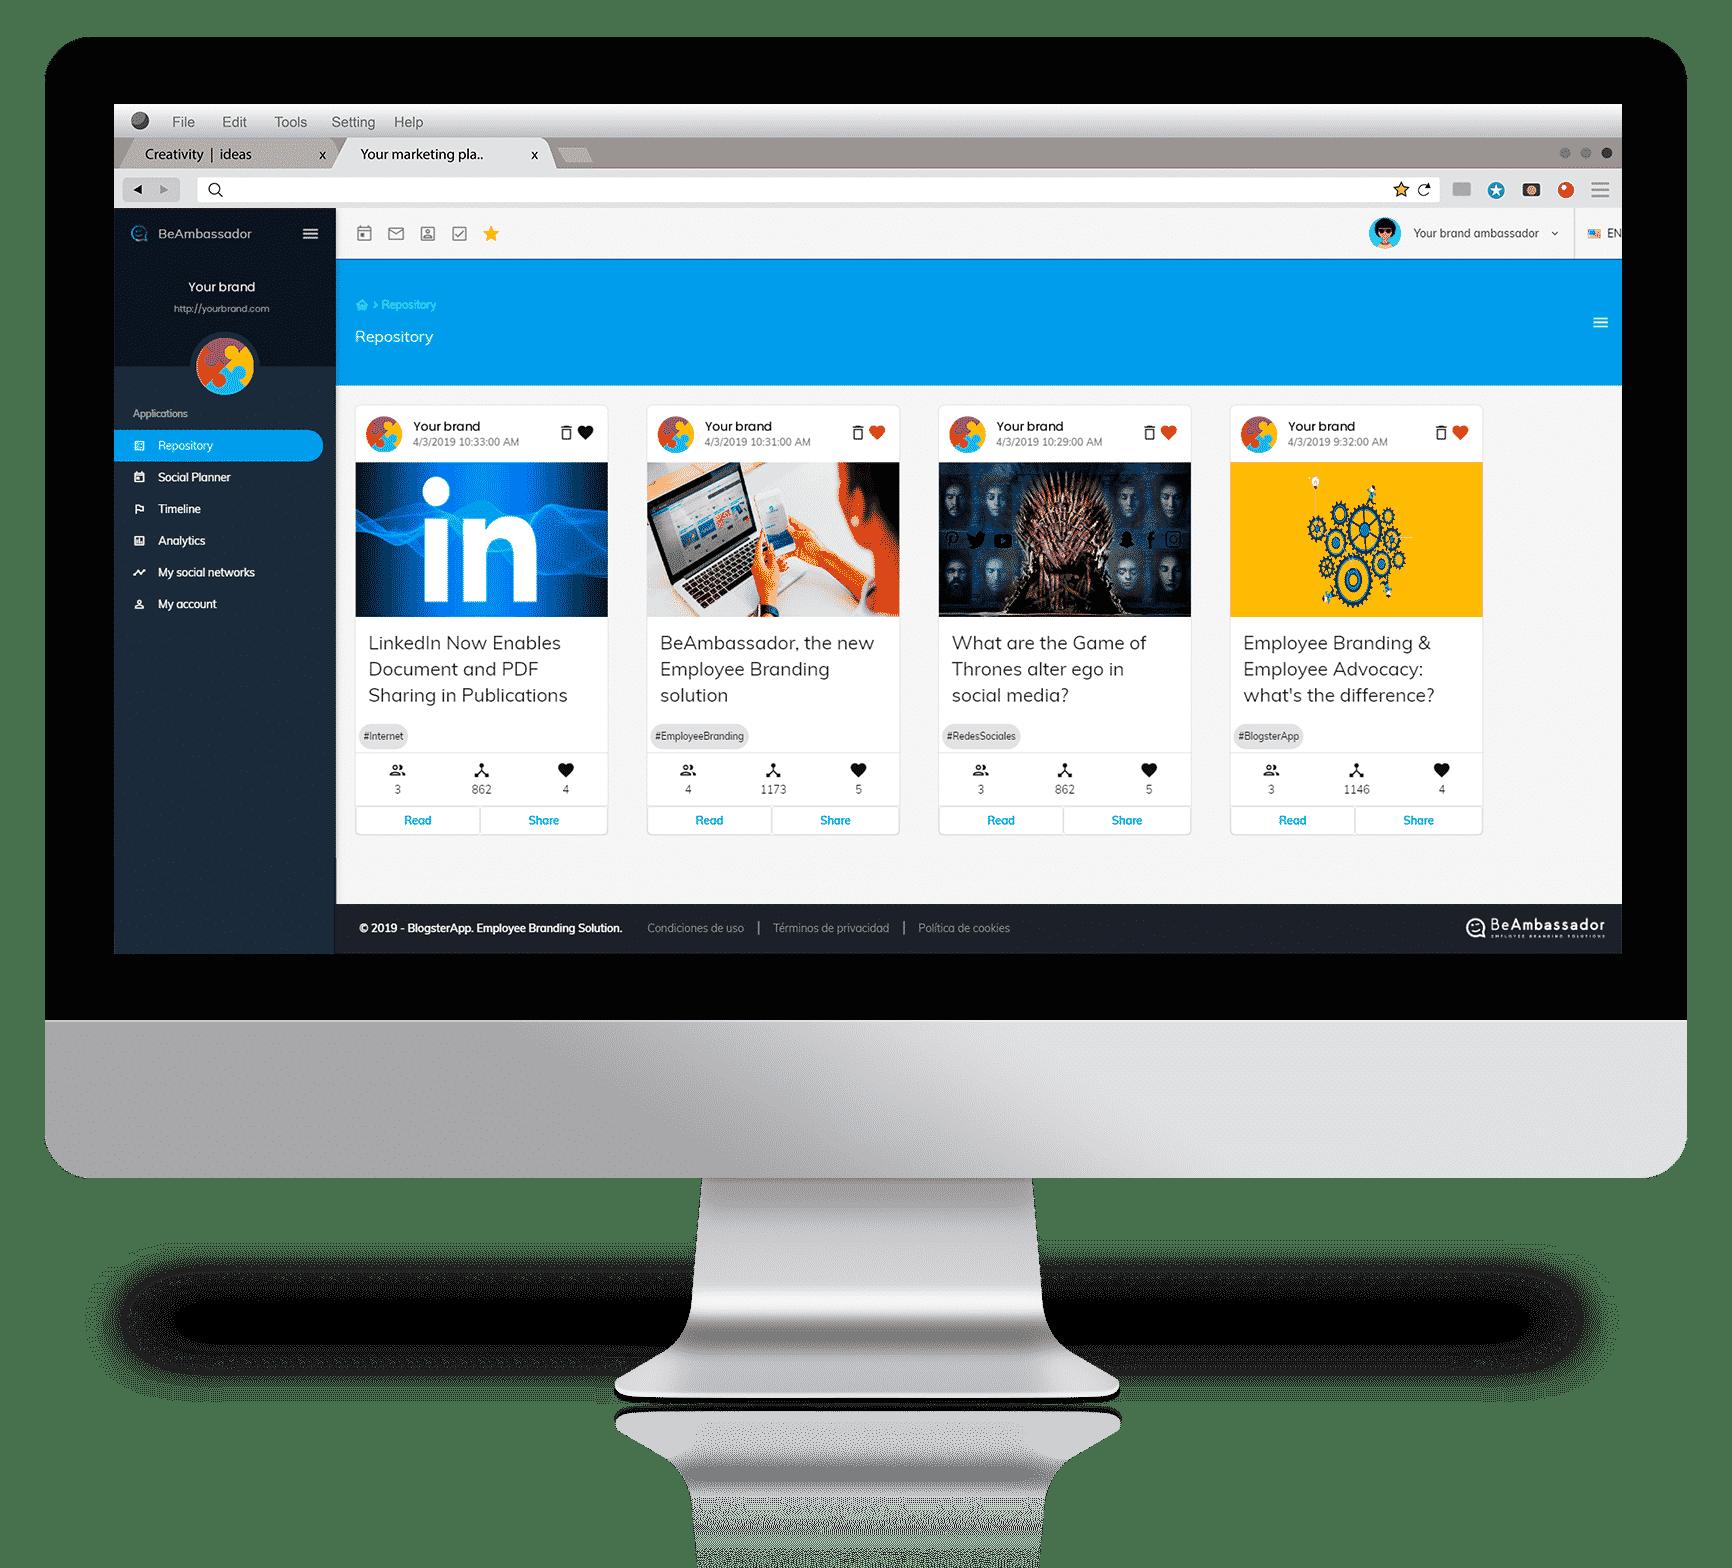 Content Library BeAmbassador Brand Ambassador Employee Branding